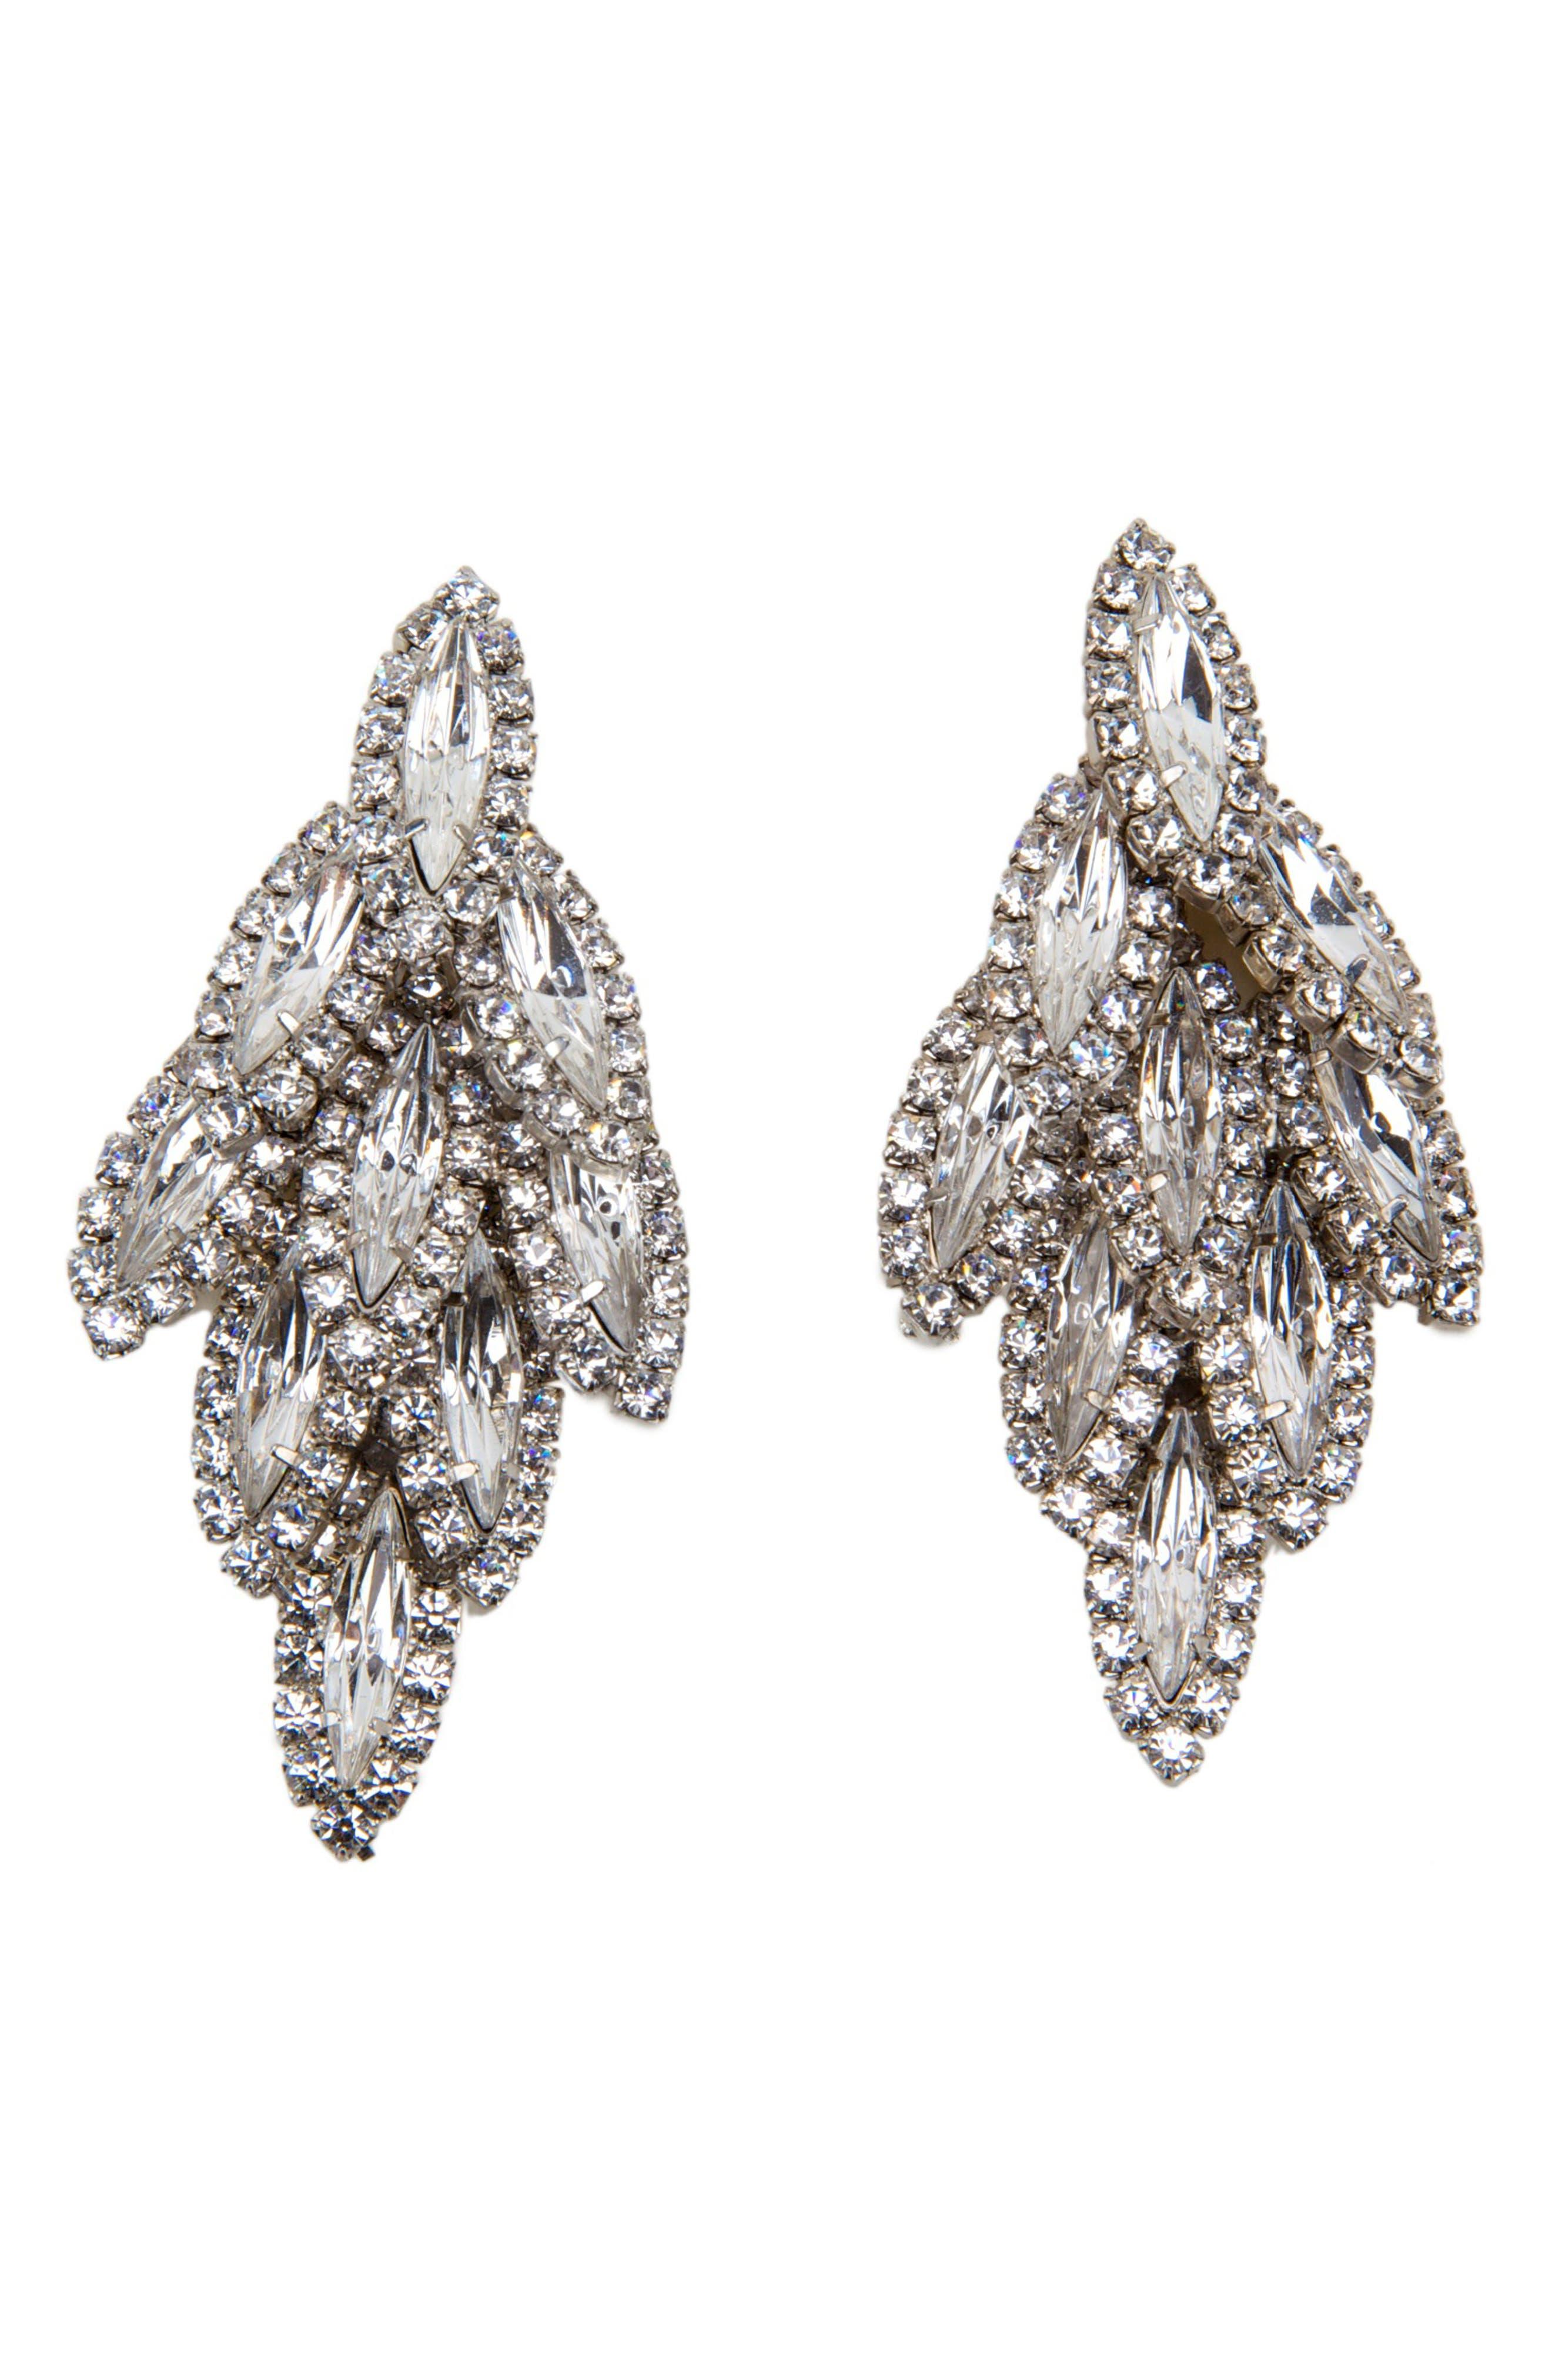 Main Image - Elizabeth Cole Bacall Crystal Drop Earrings